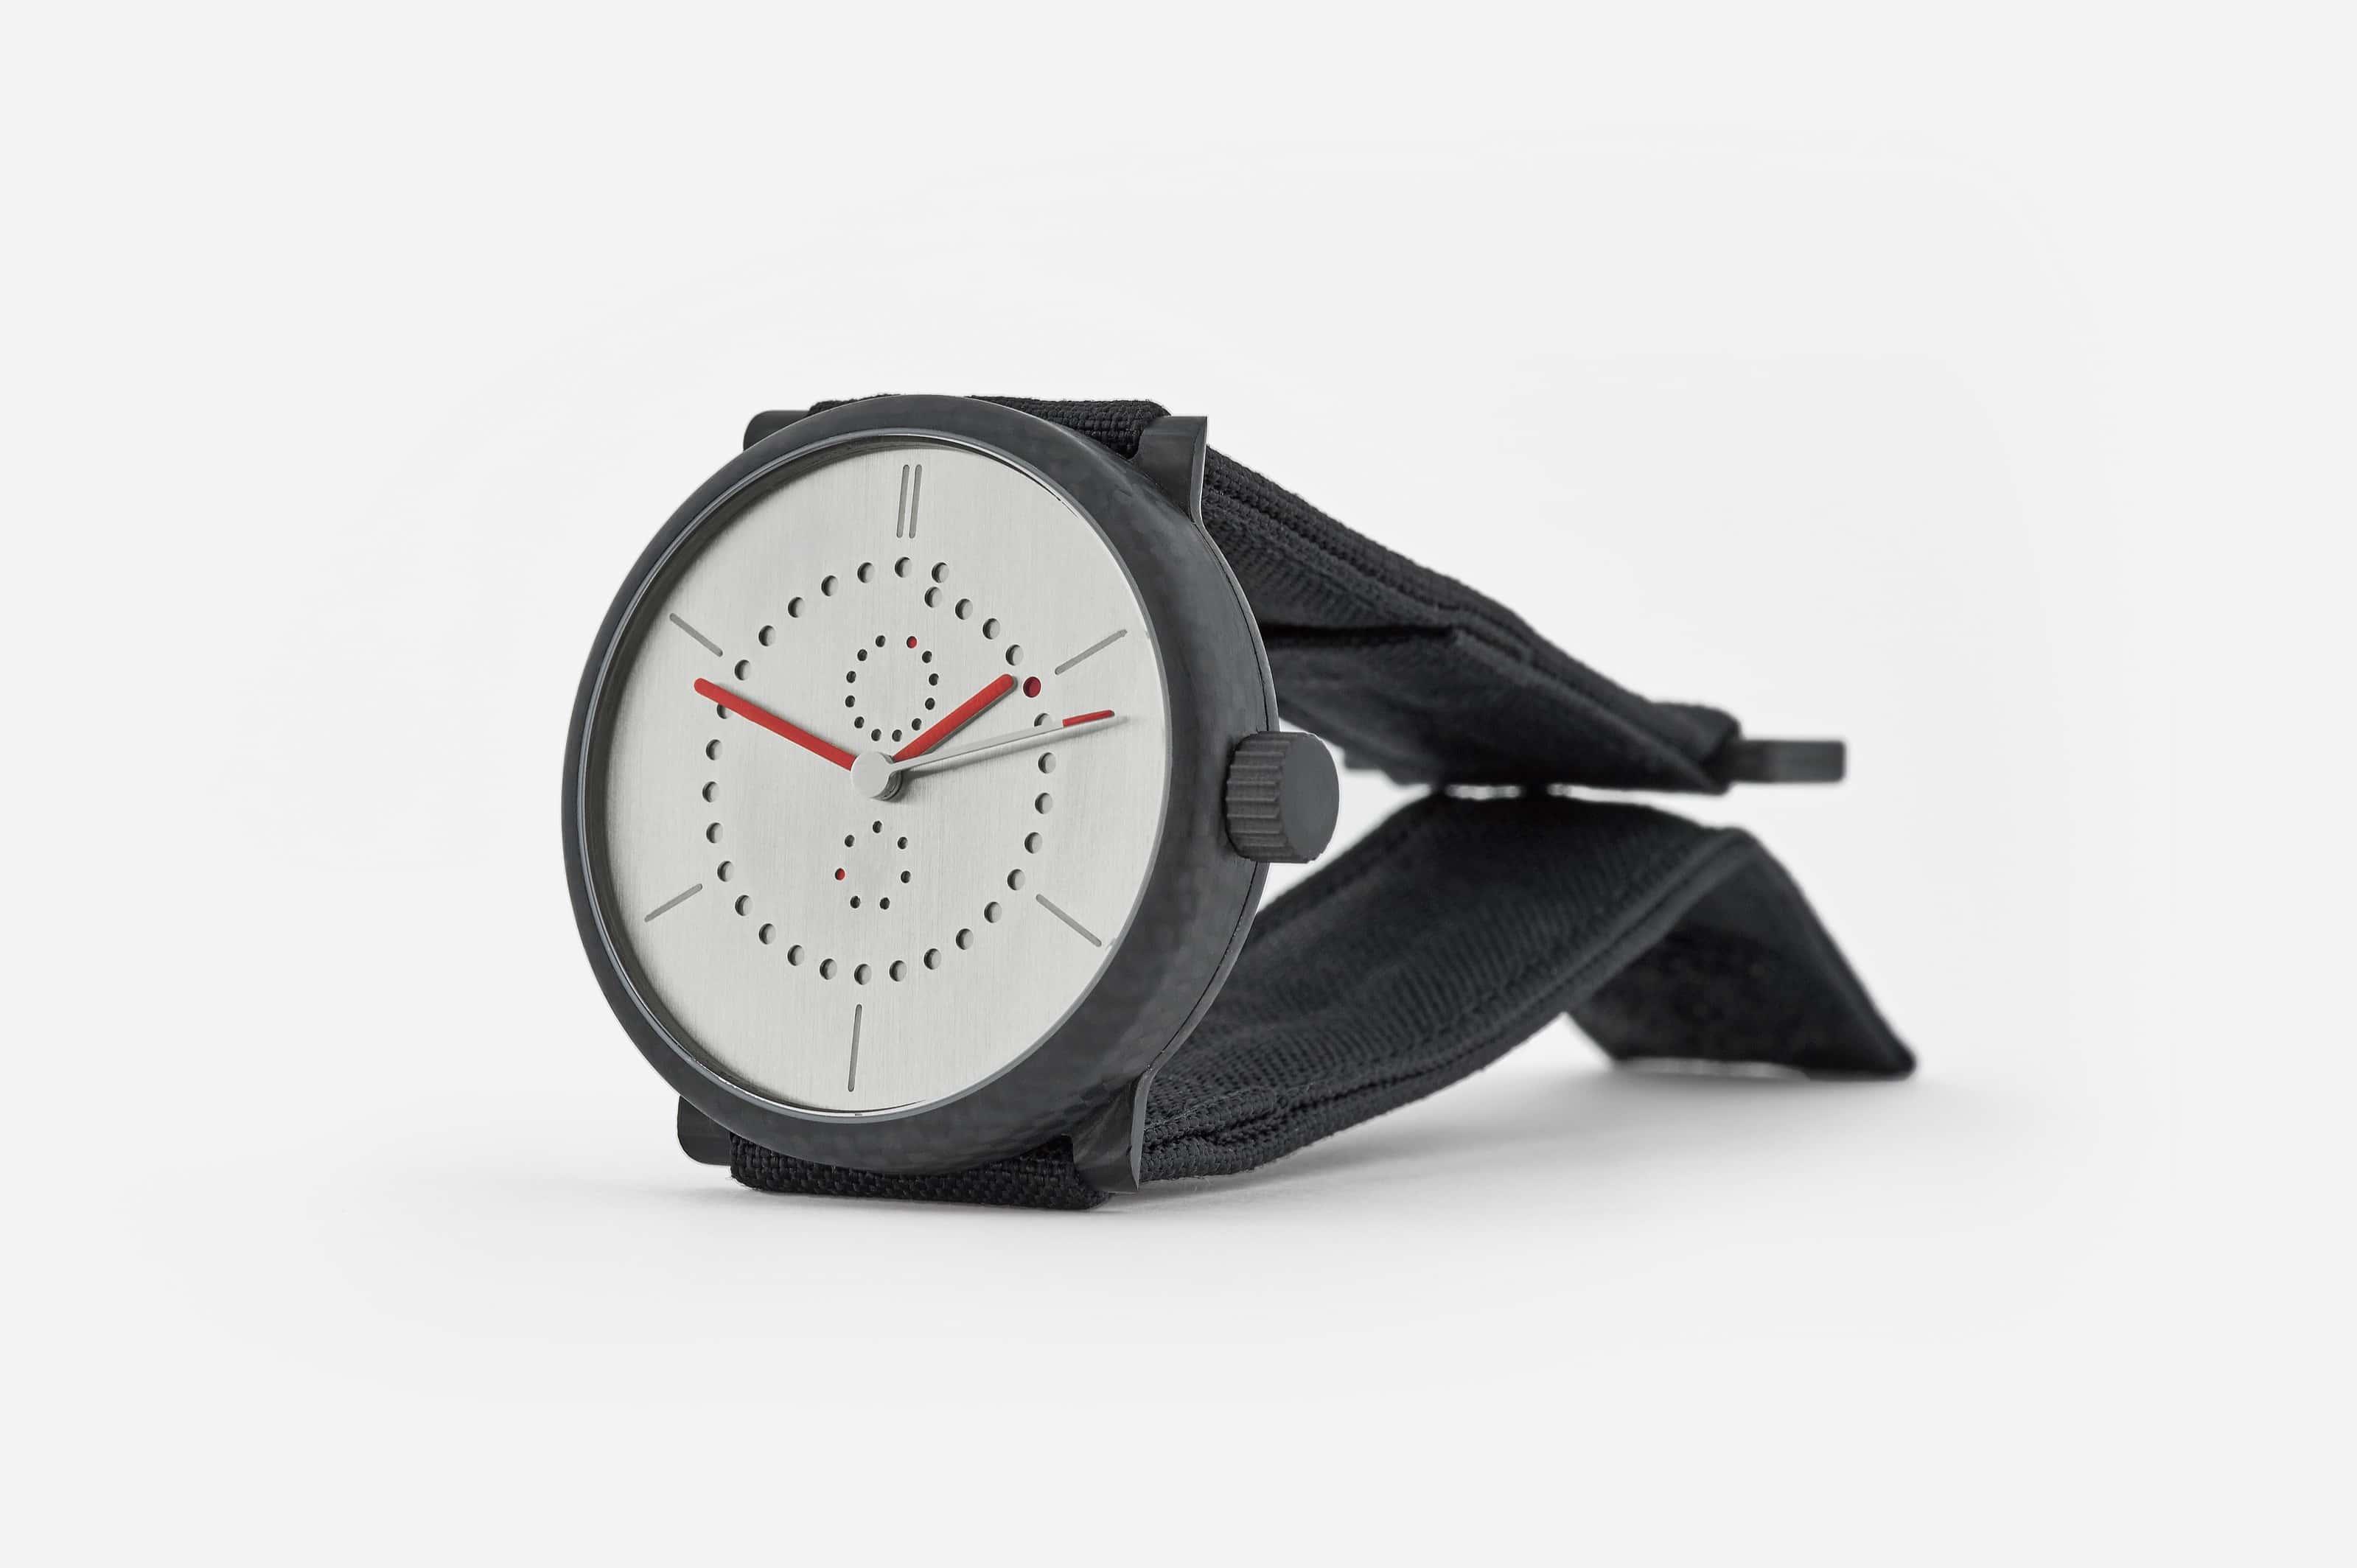 carbon-fiber-annual-calendar-watch-ochs-und-junior-12_RGB-3198px